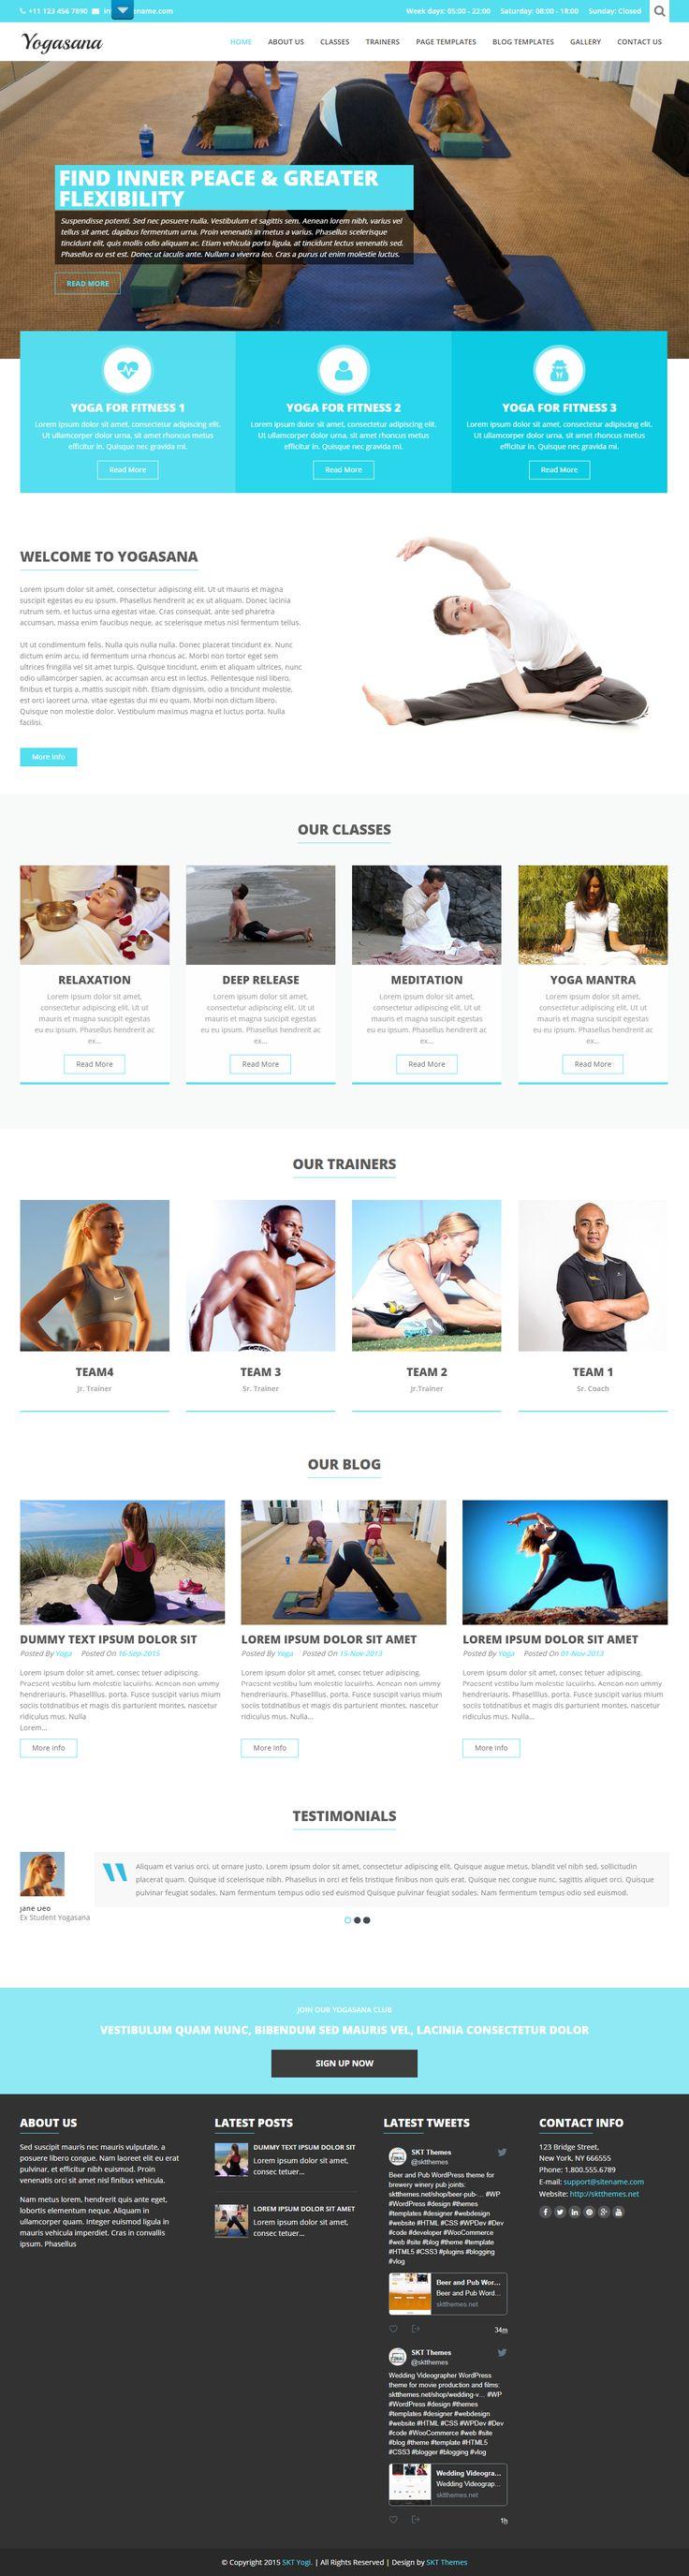 Free Yoga WordPress Theme for Yoga Trainers and Studios